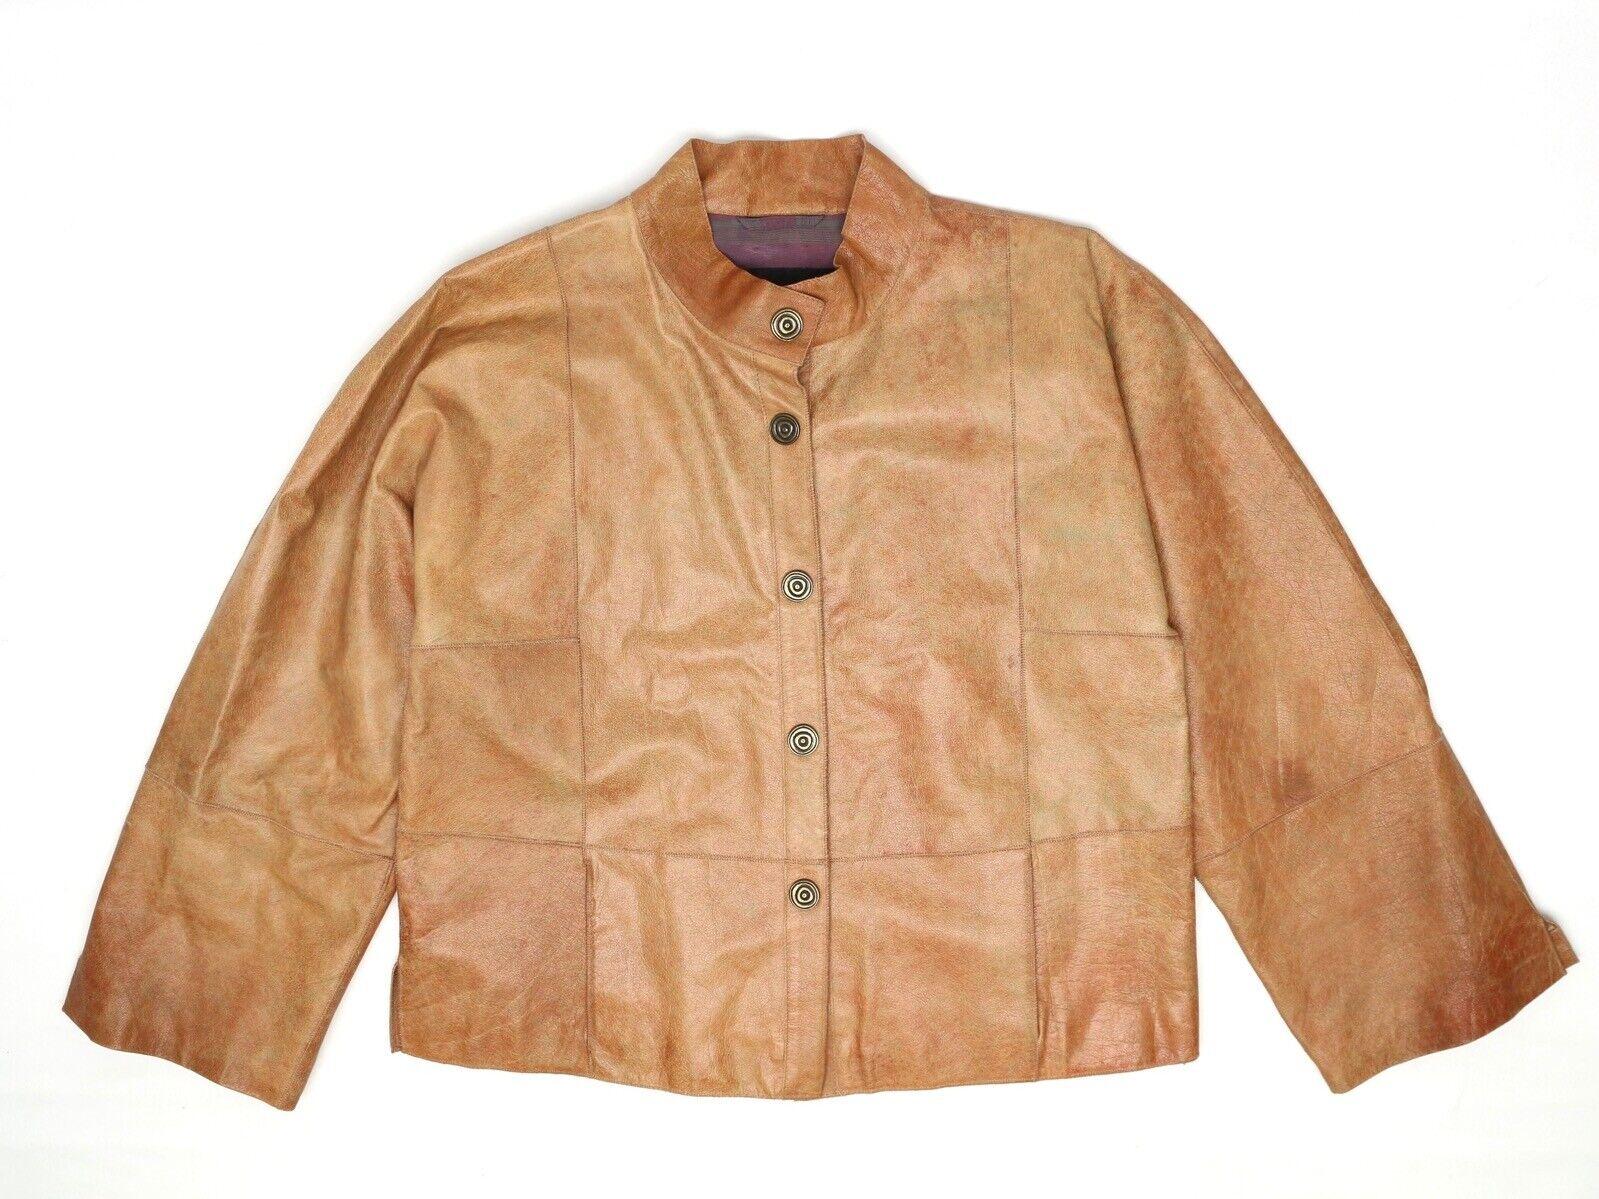 Giorgio Armani Veste Femme  42 marrón Cuir Buffalo Snap avant Manteau Patchwork  elige tu favorito